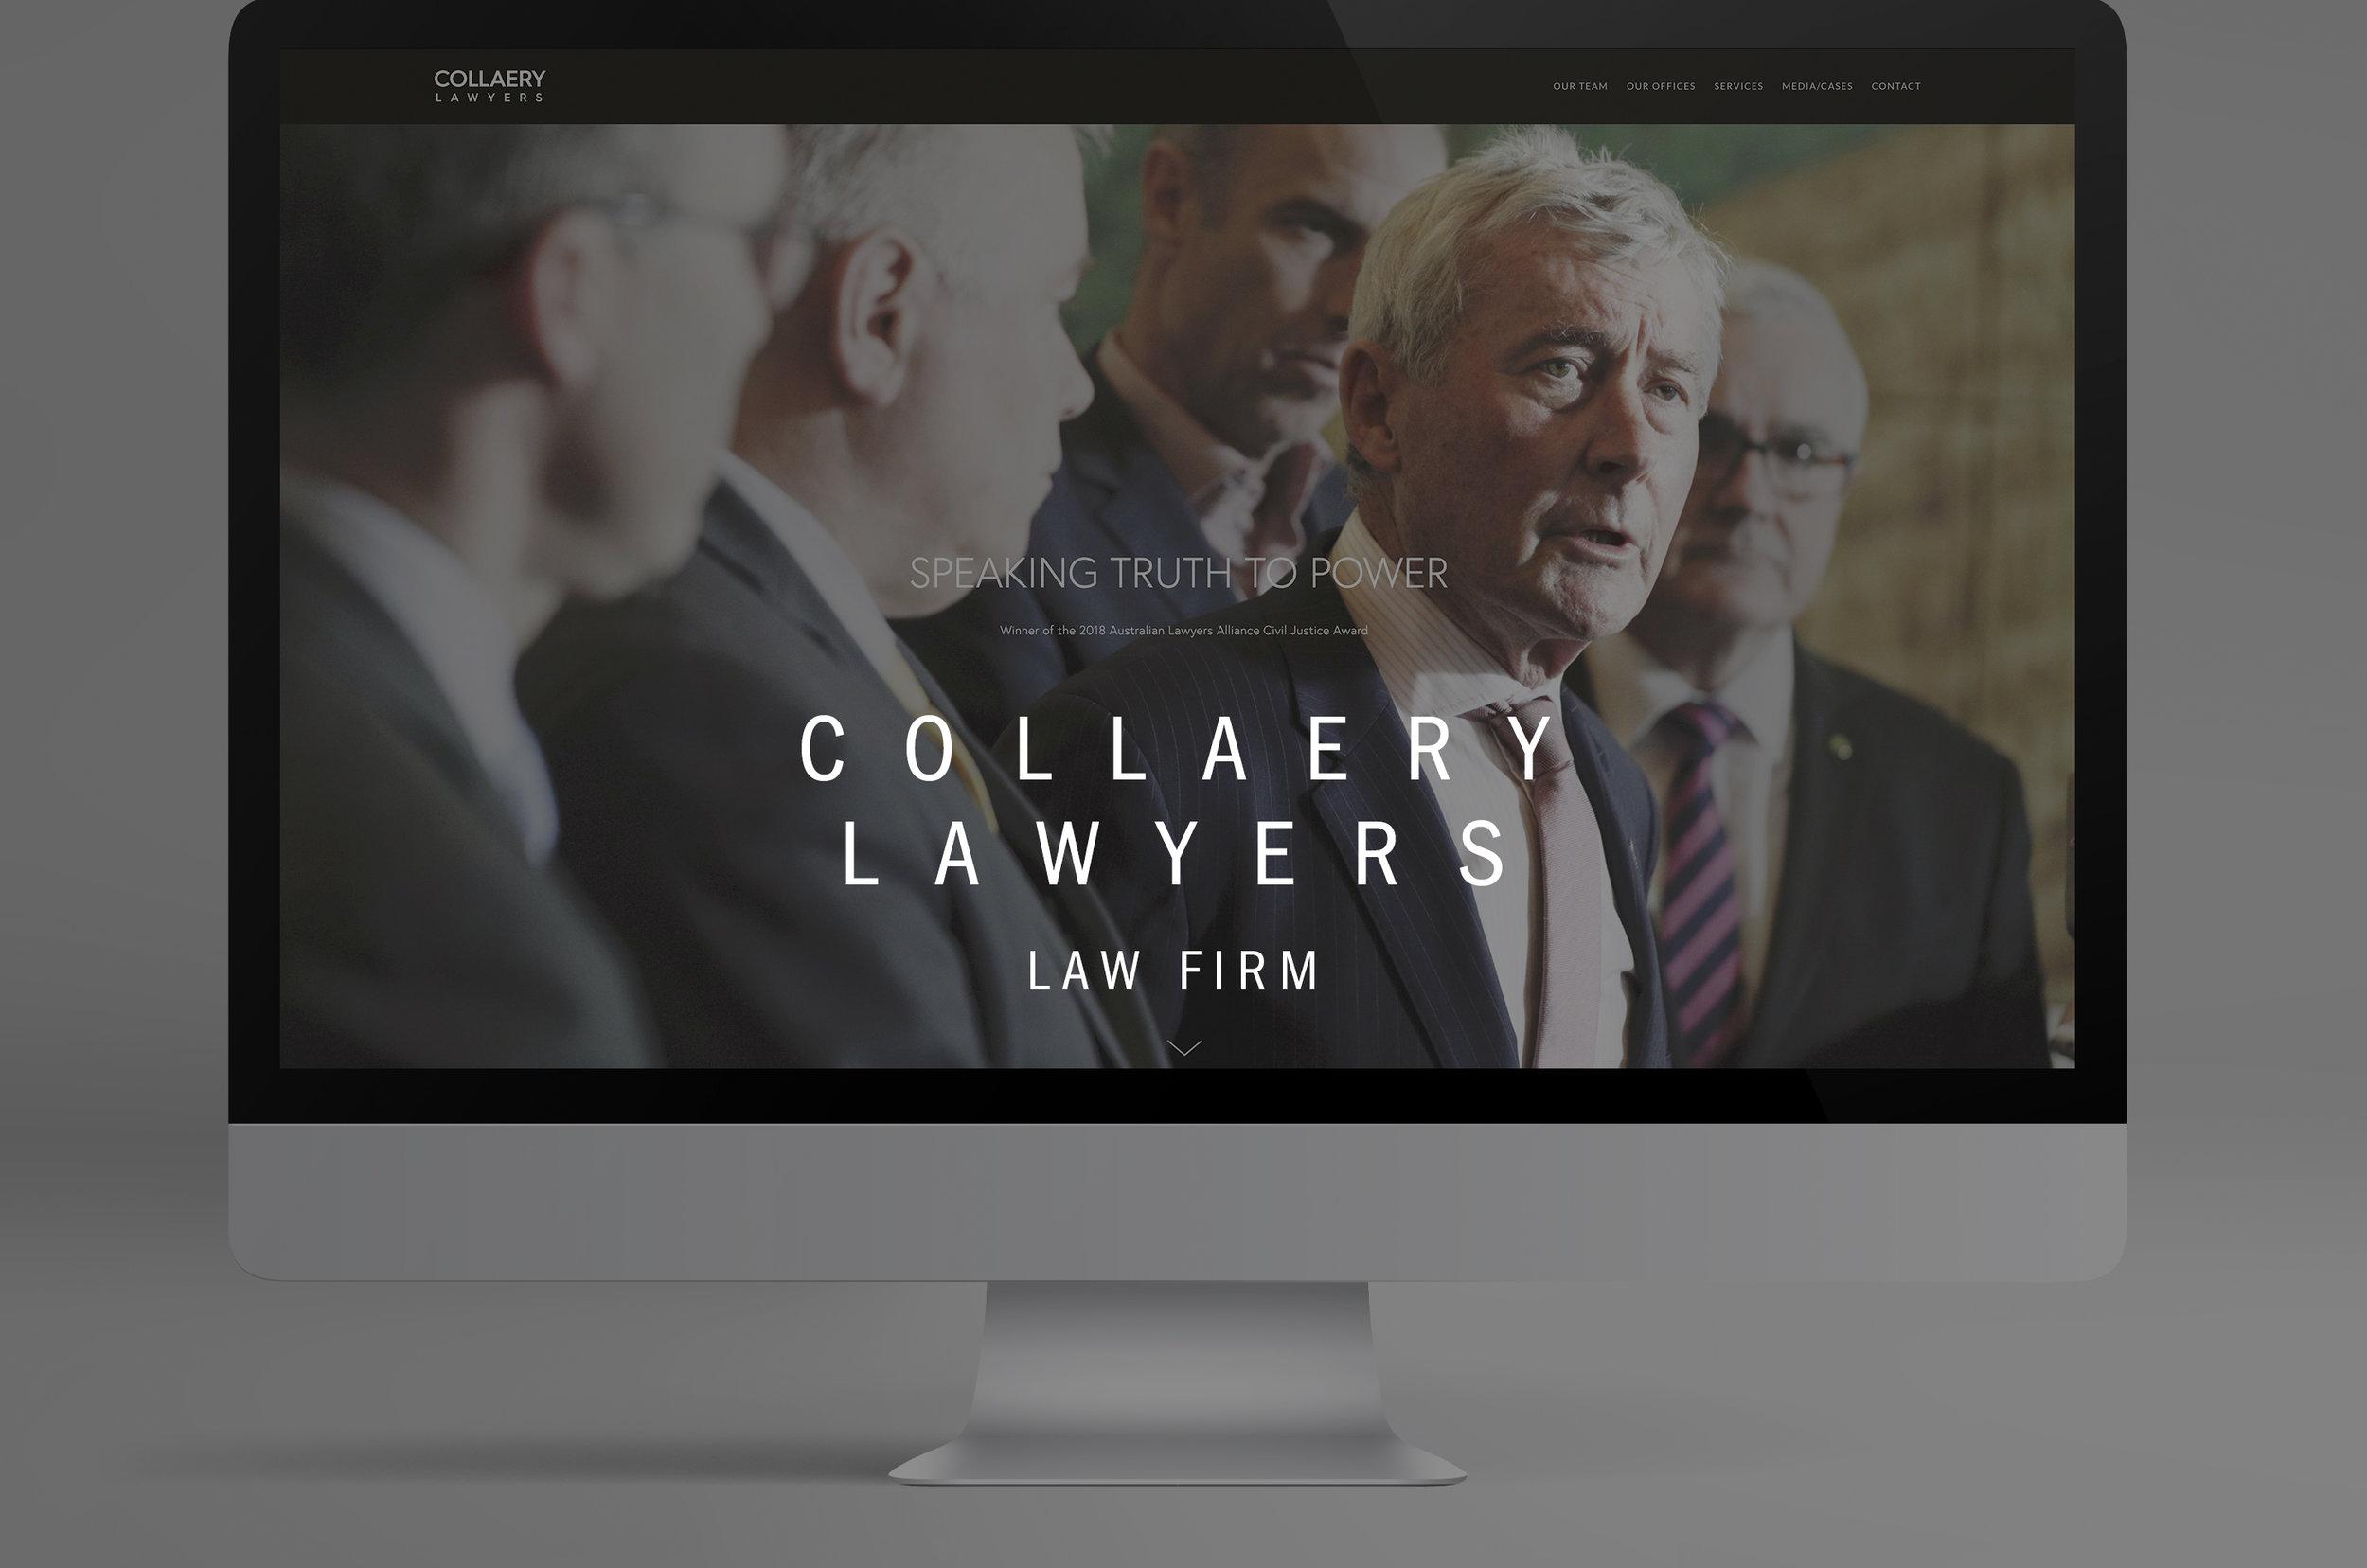 Collaery Lawyers Law Firm Australia International Bernard Collaery